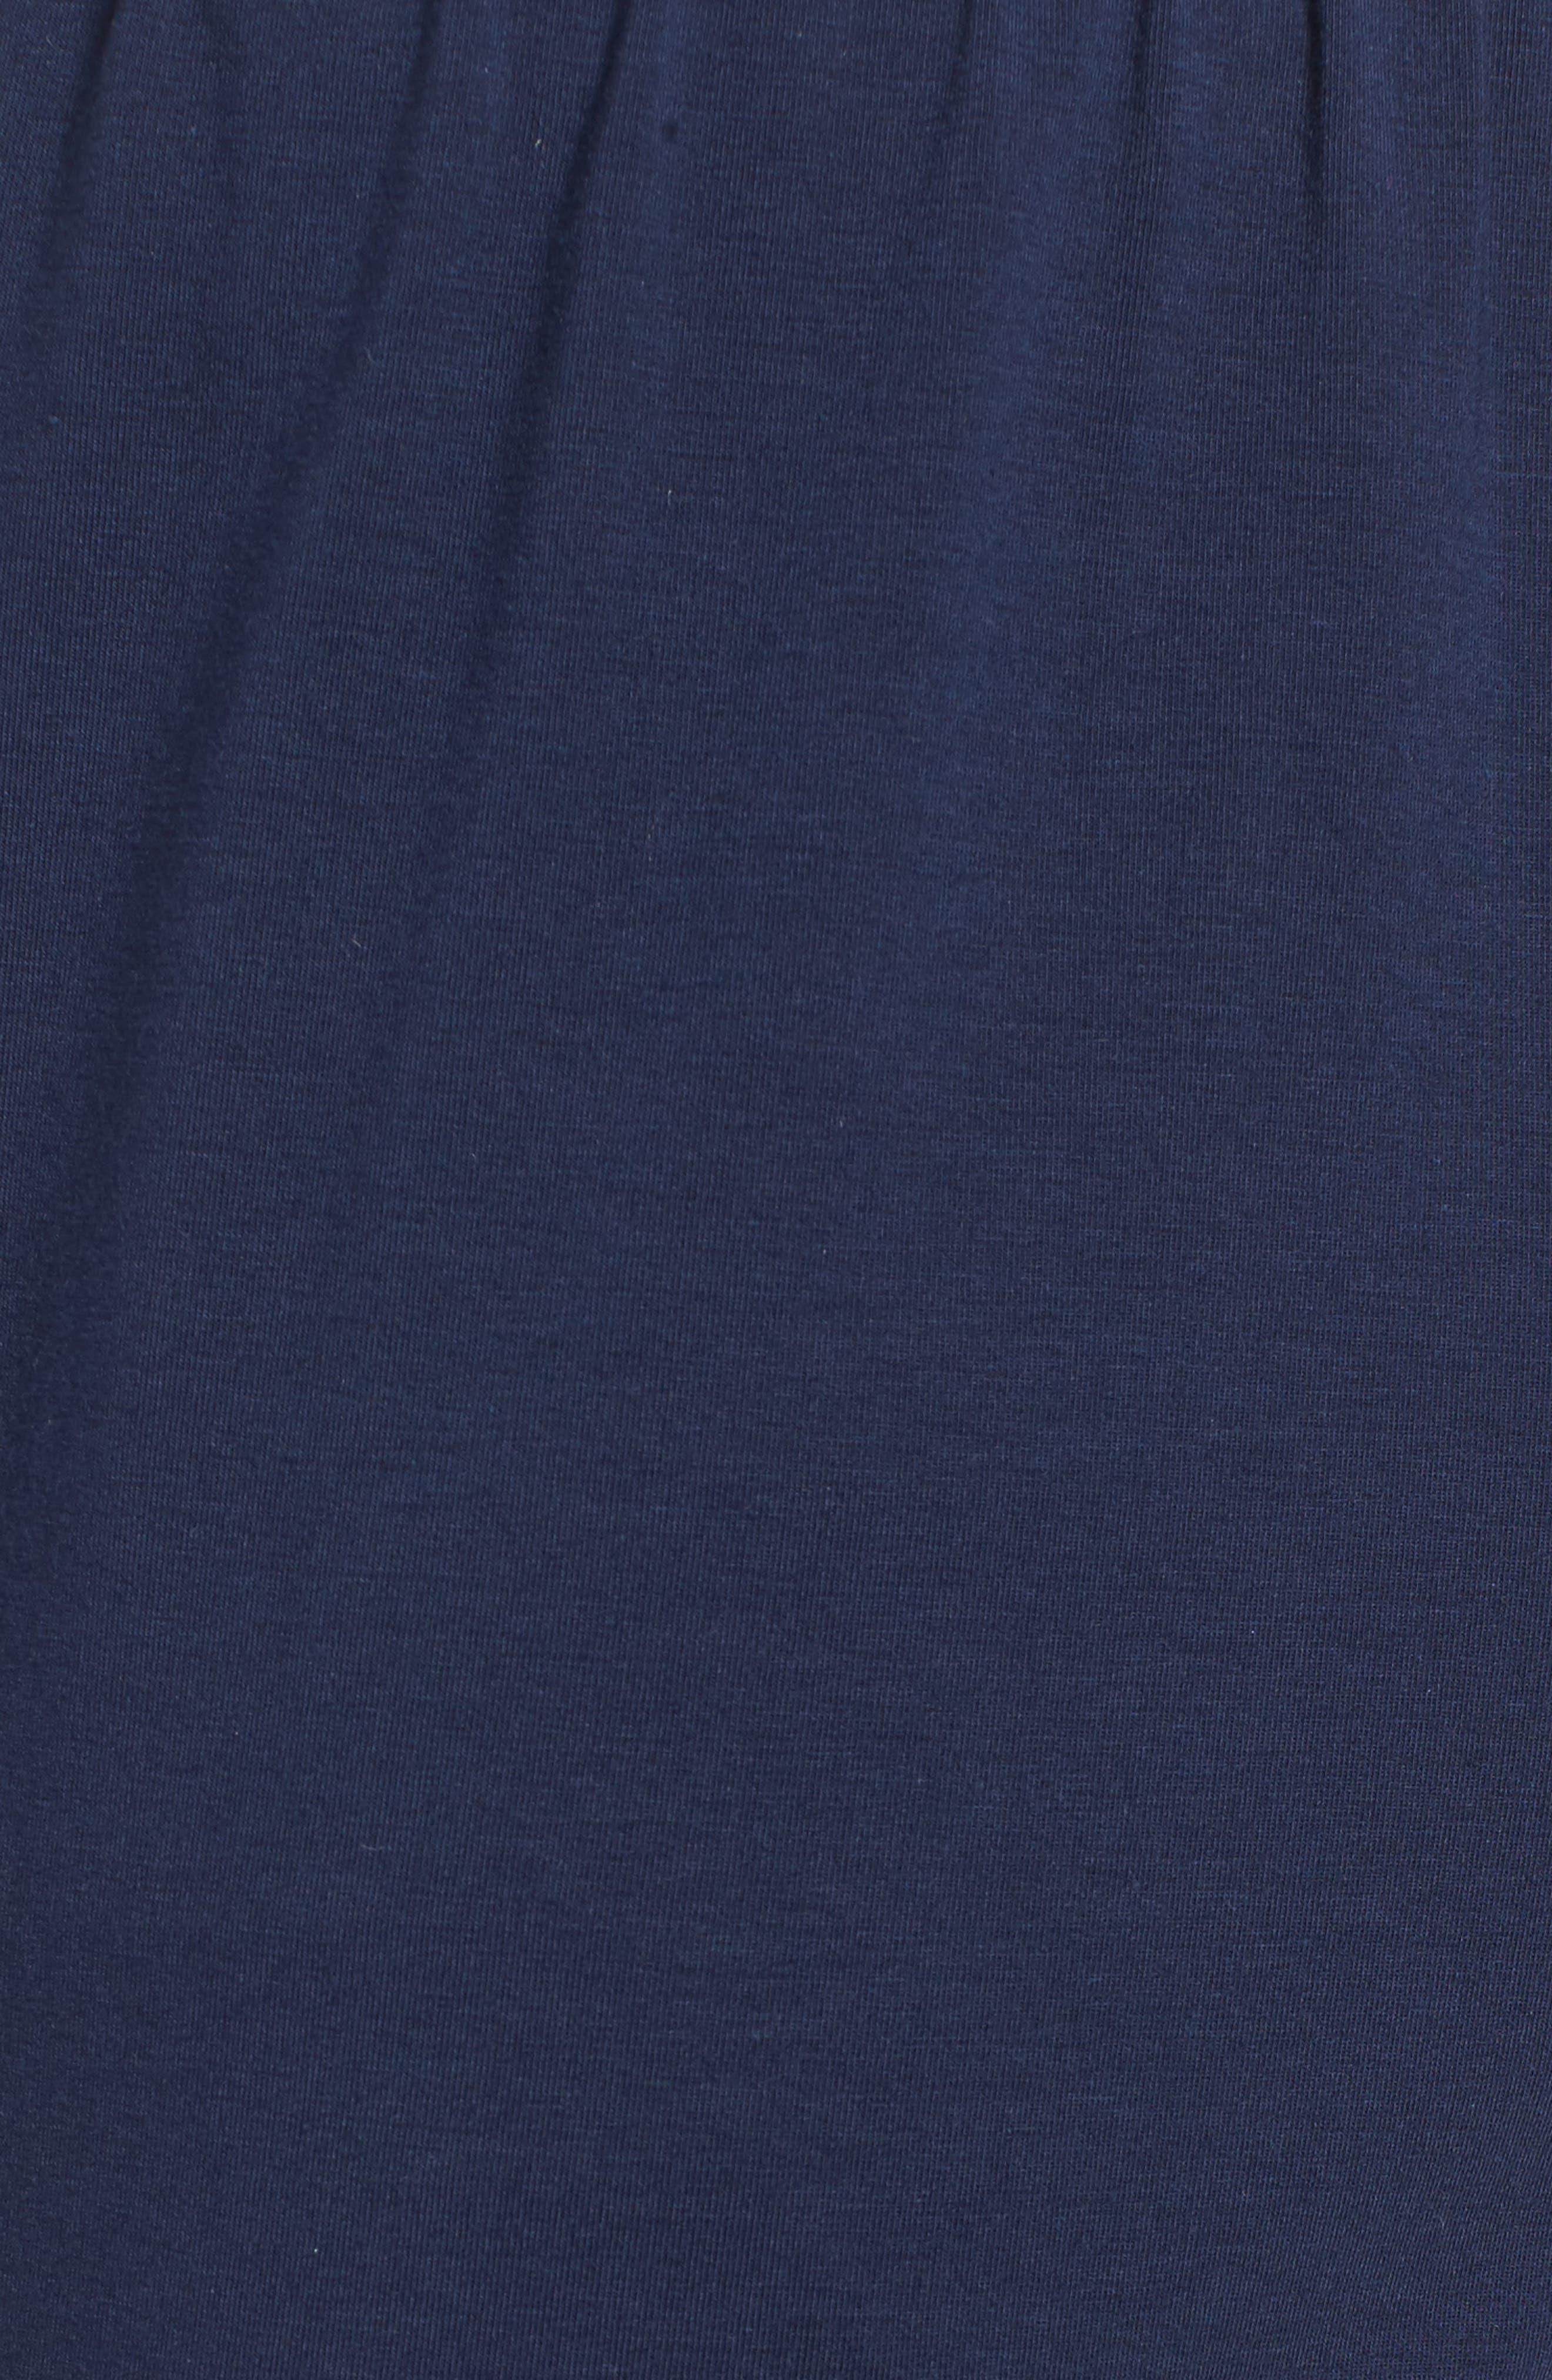 Micromodal Blend Lounge Pants,                             Alternate thumbnail 10, color,